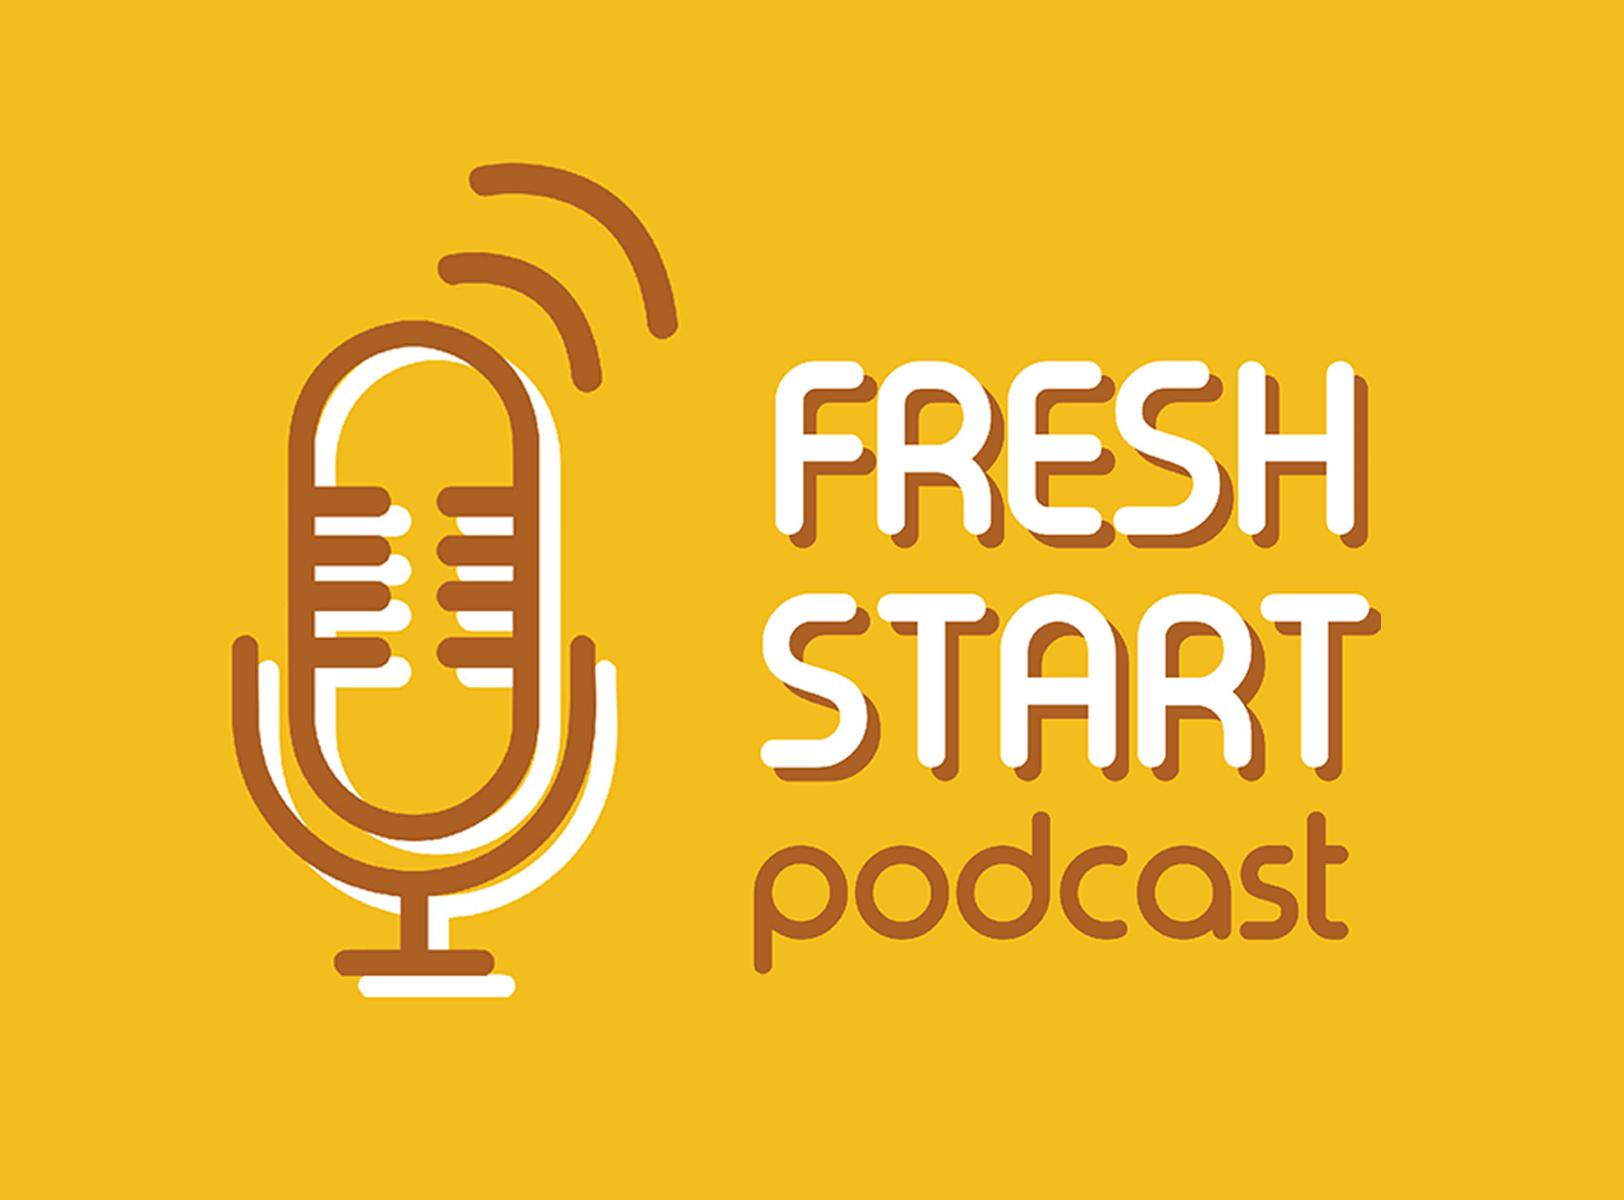 Fresh Start: Podcast News (6/2/2020 Tue.)